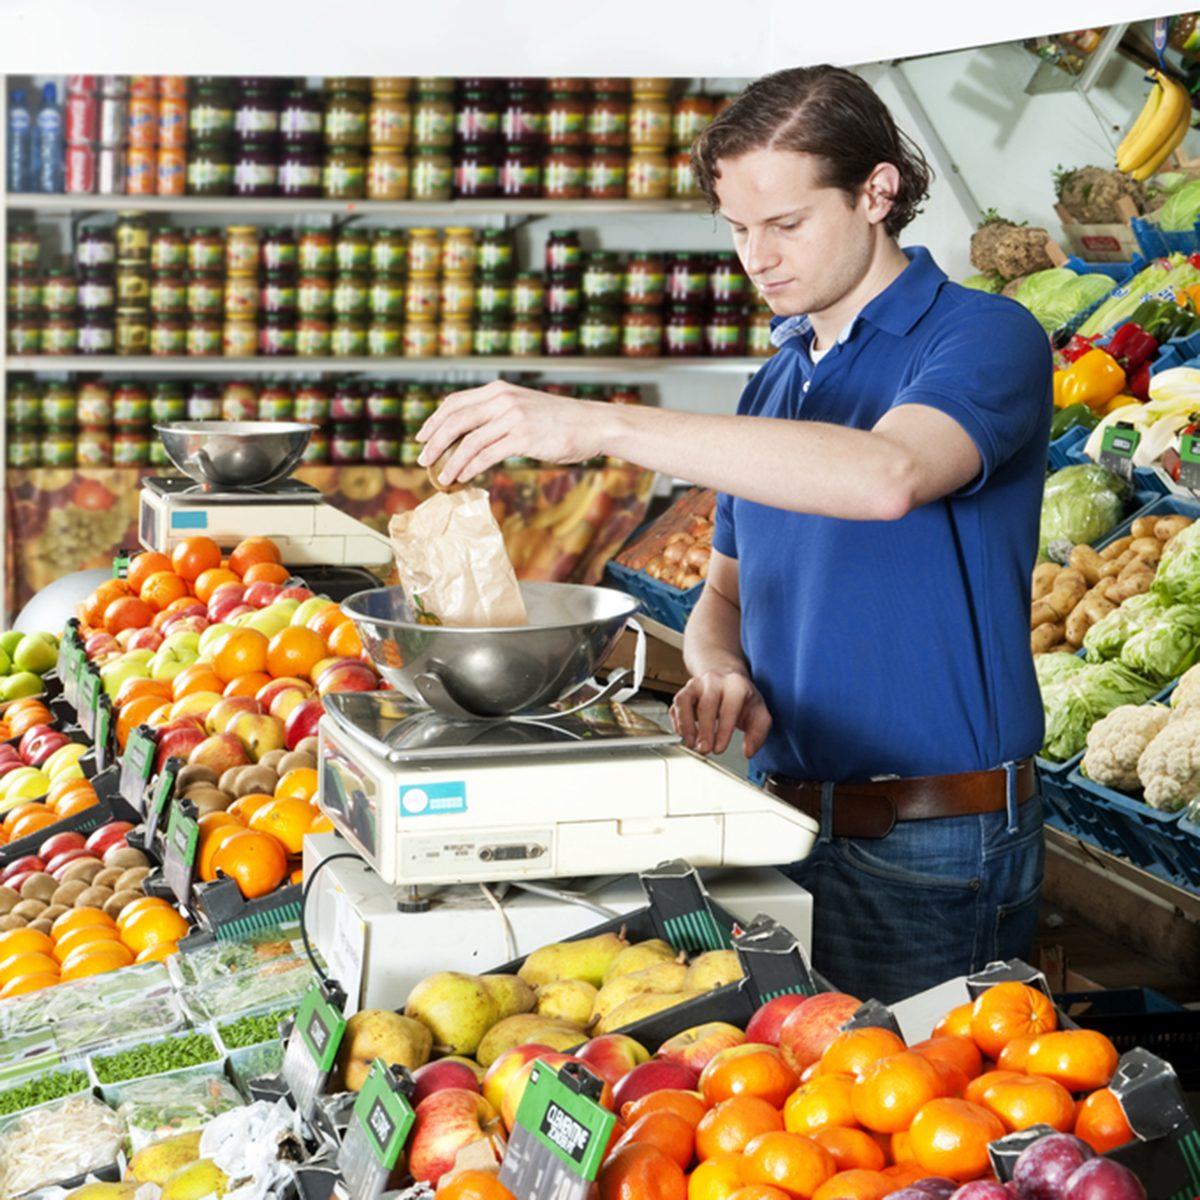 Greengrocer weighing fresh food on a digital scale